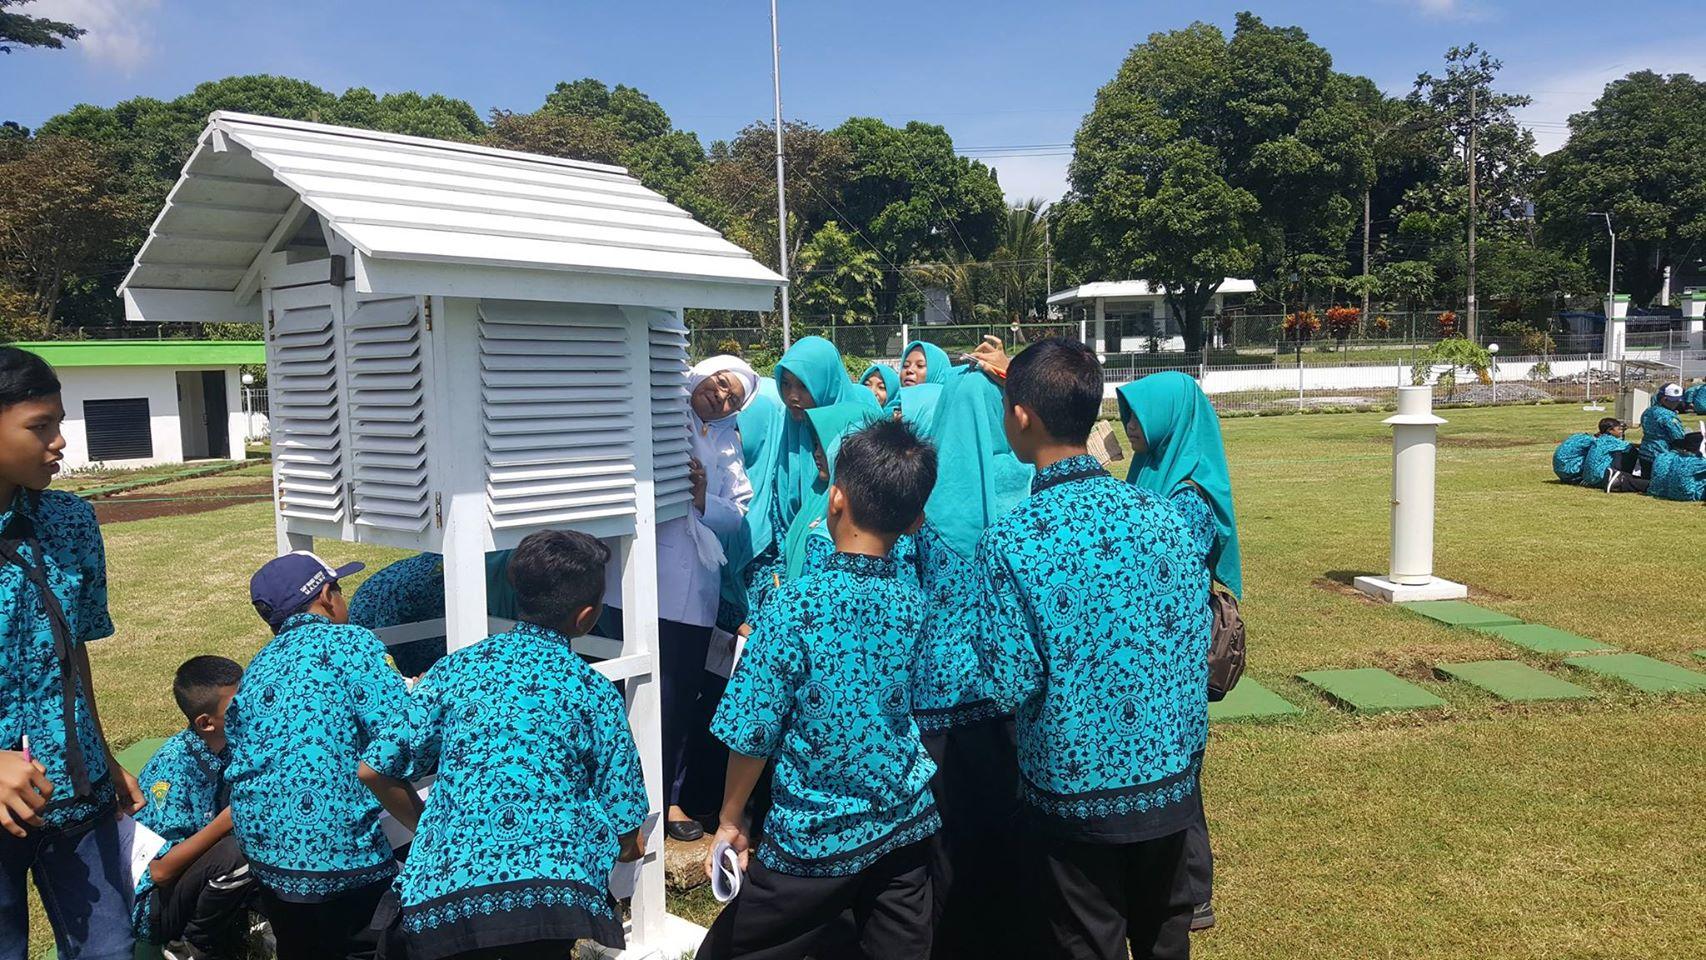 Rabu, 21-12-2016 Kunjungan SMP Wahid Hasyim Kota Malang